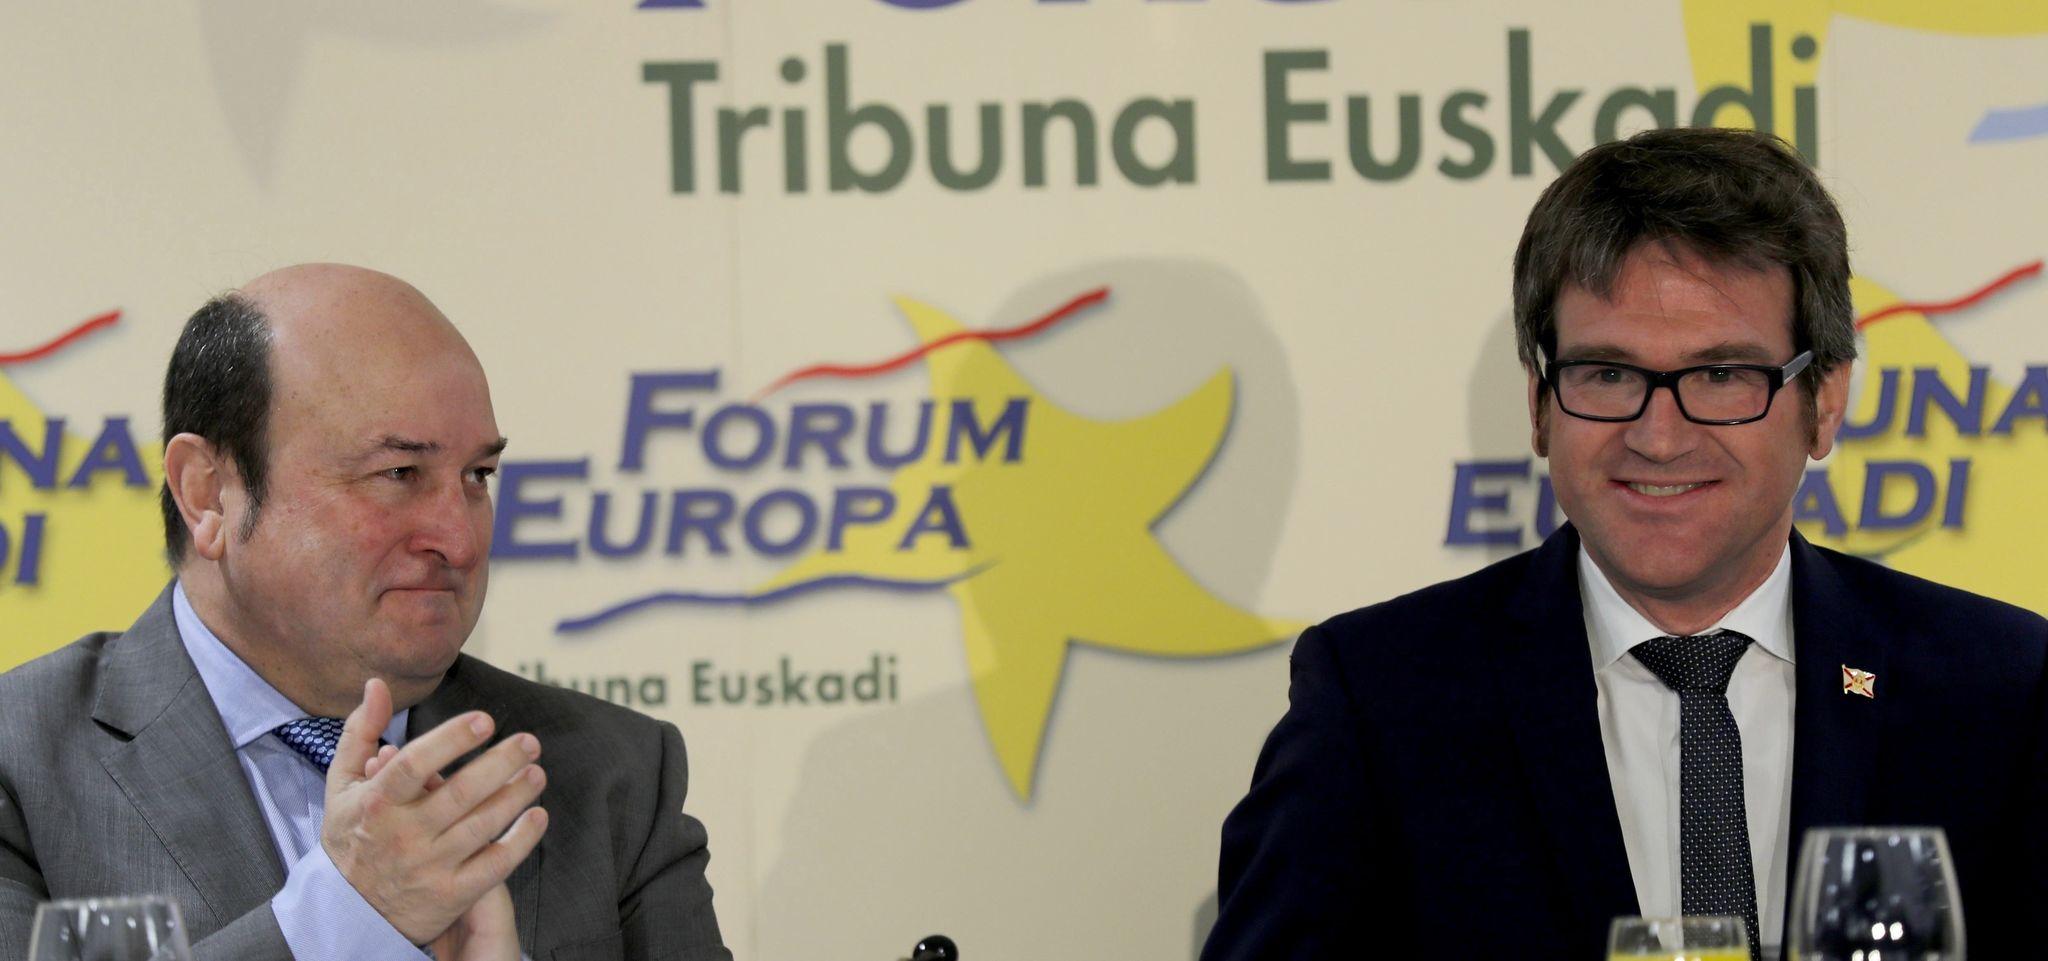 El presidente del PNV Andoni Ortuzar aplaude al alcalde de Vitoria Gorka Urtaran, en Bilbao.